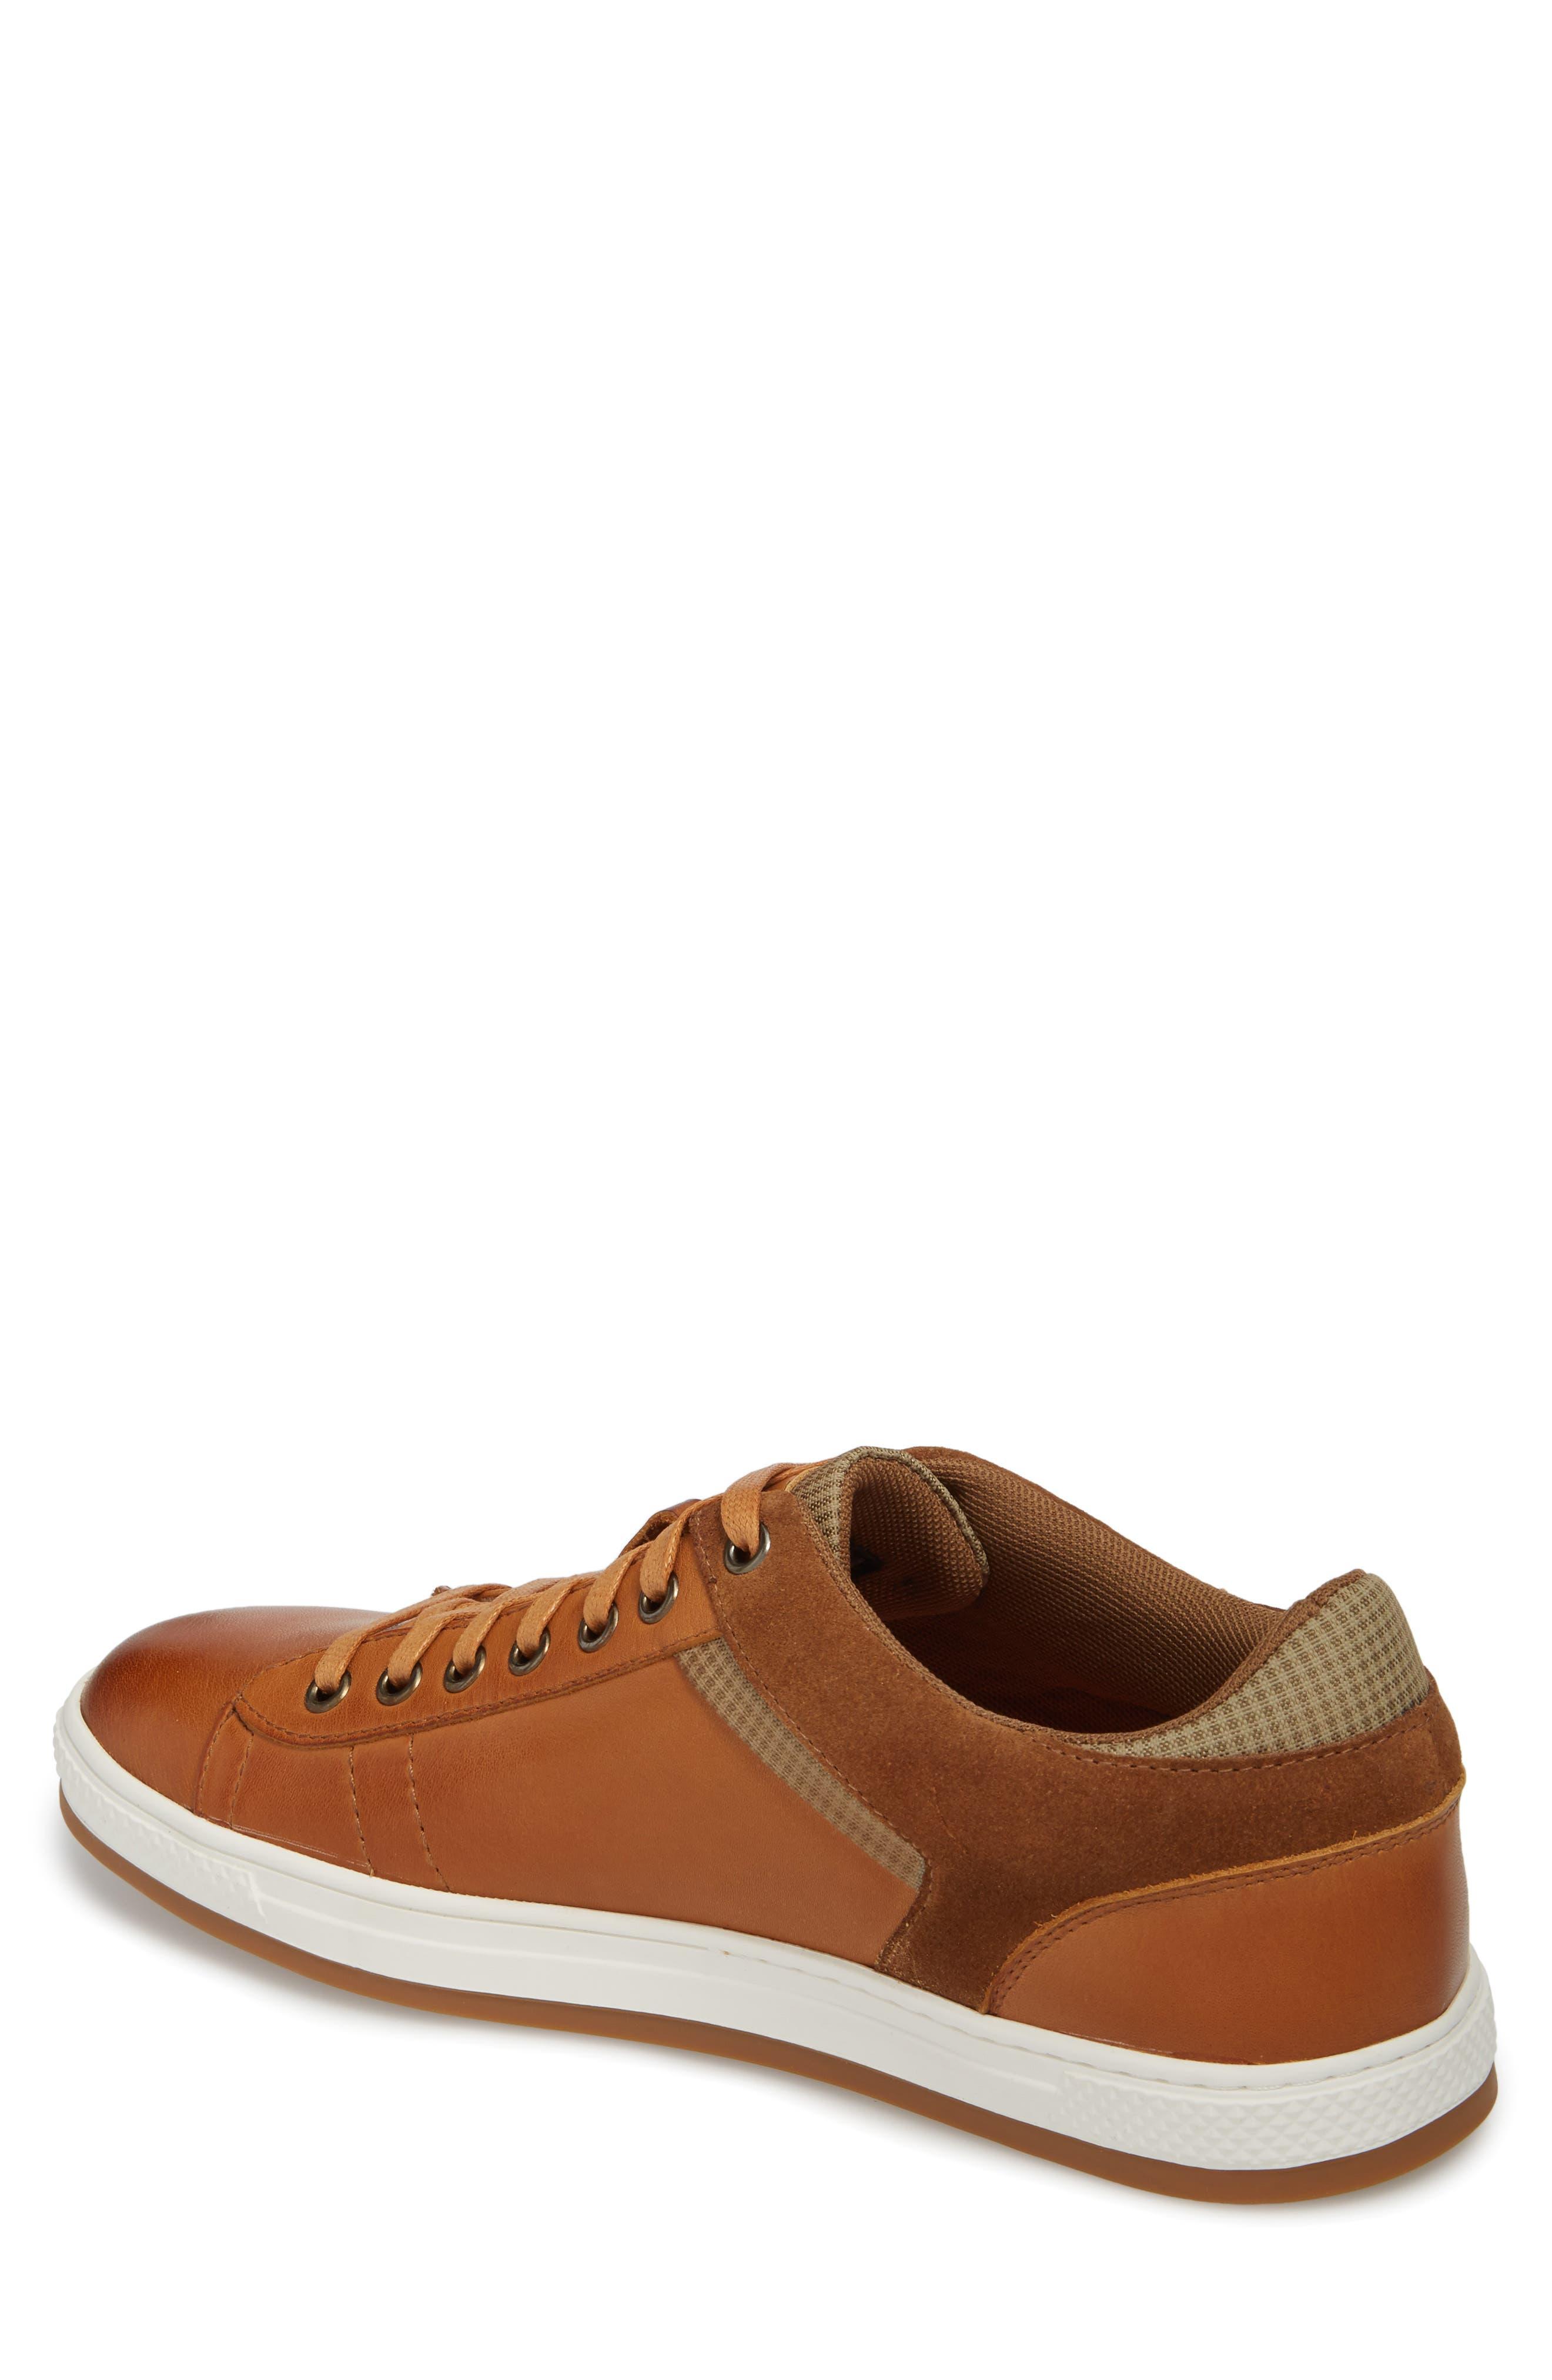 Ireton Low Top Sneaker,                             Alternate thumbnail 2, color,                             Cognac Leather/ Suede